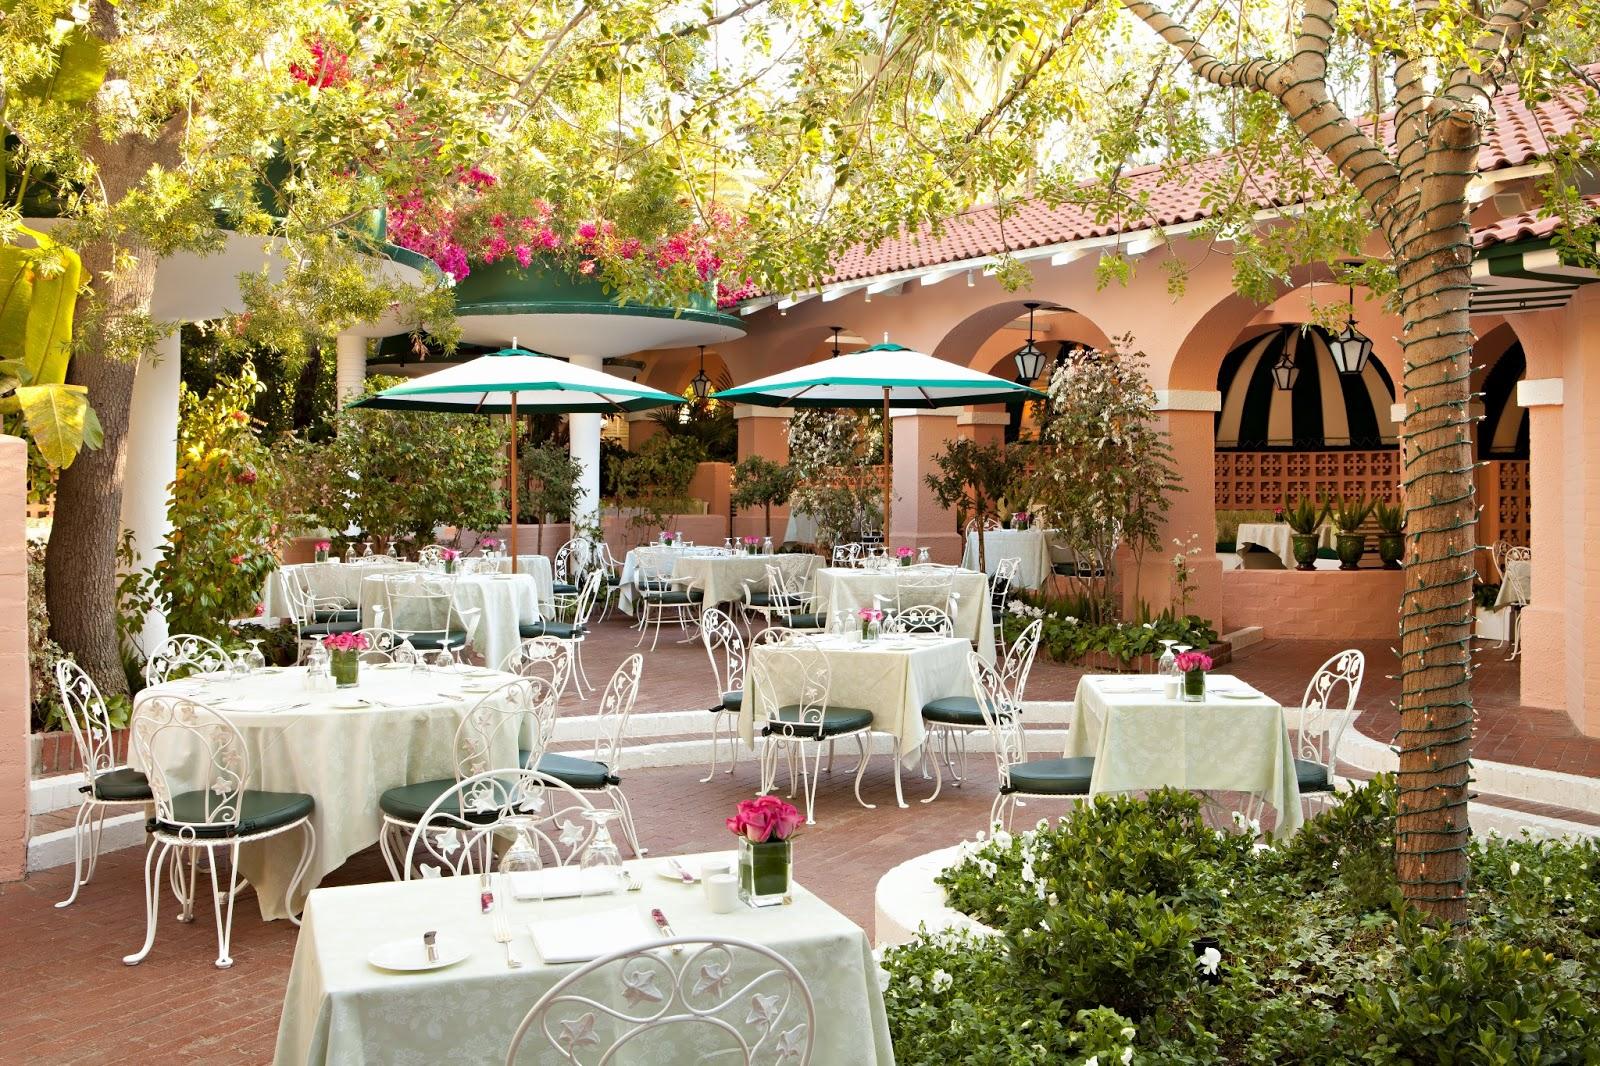 the beverly hills hotel pink green poolside renovations. Black Bedroom Furniture Sets. Home Design Ideas